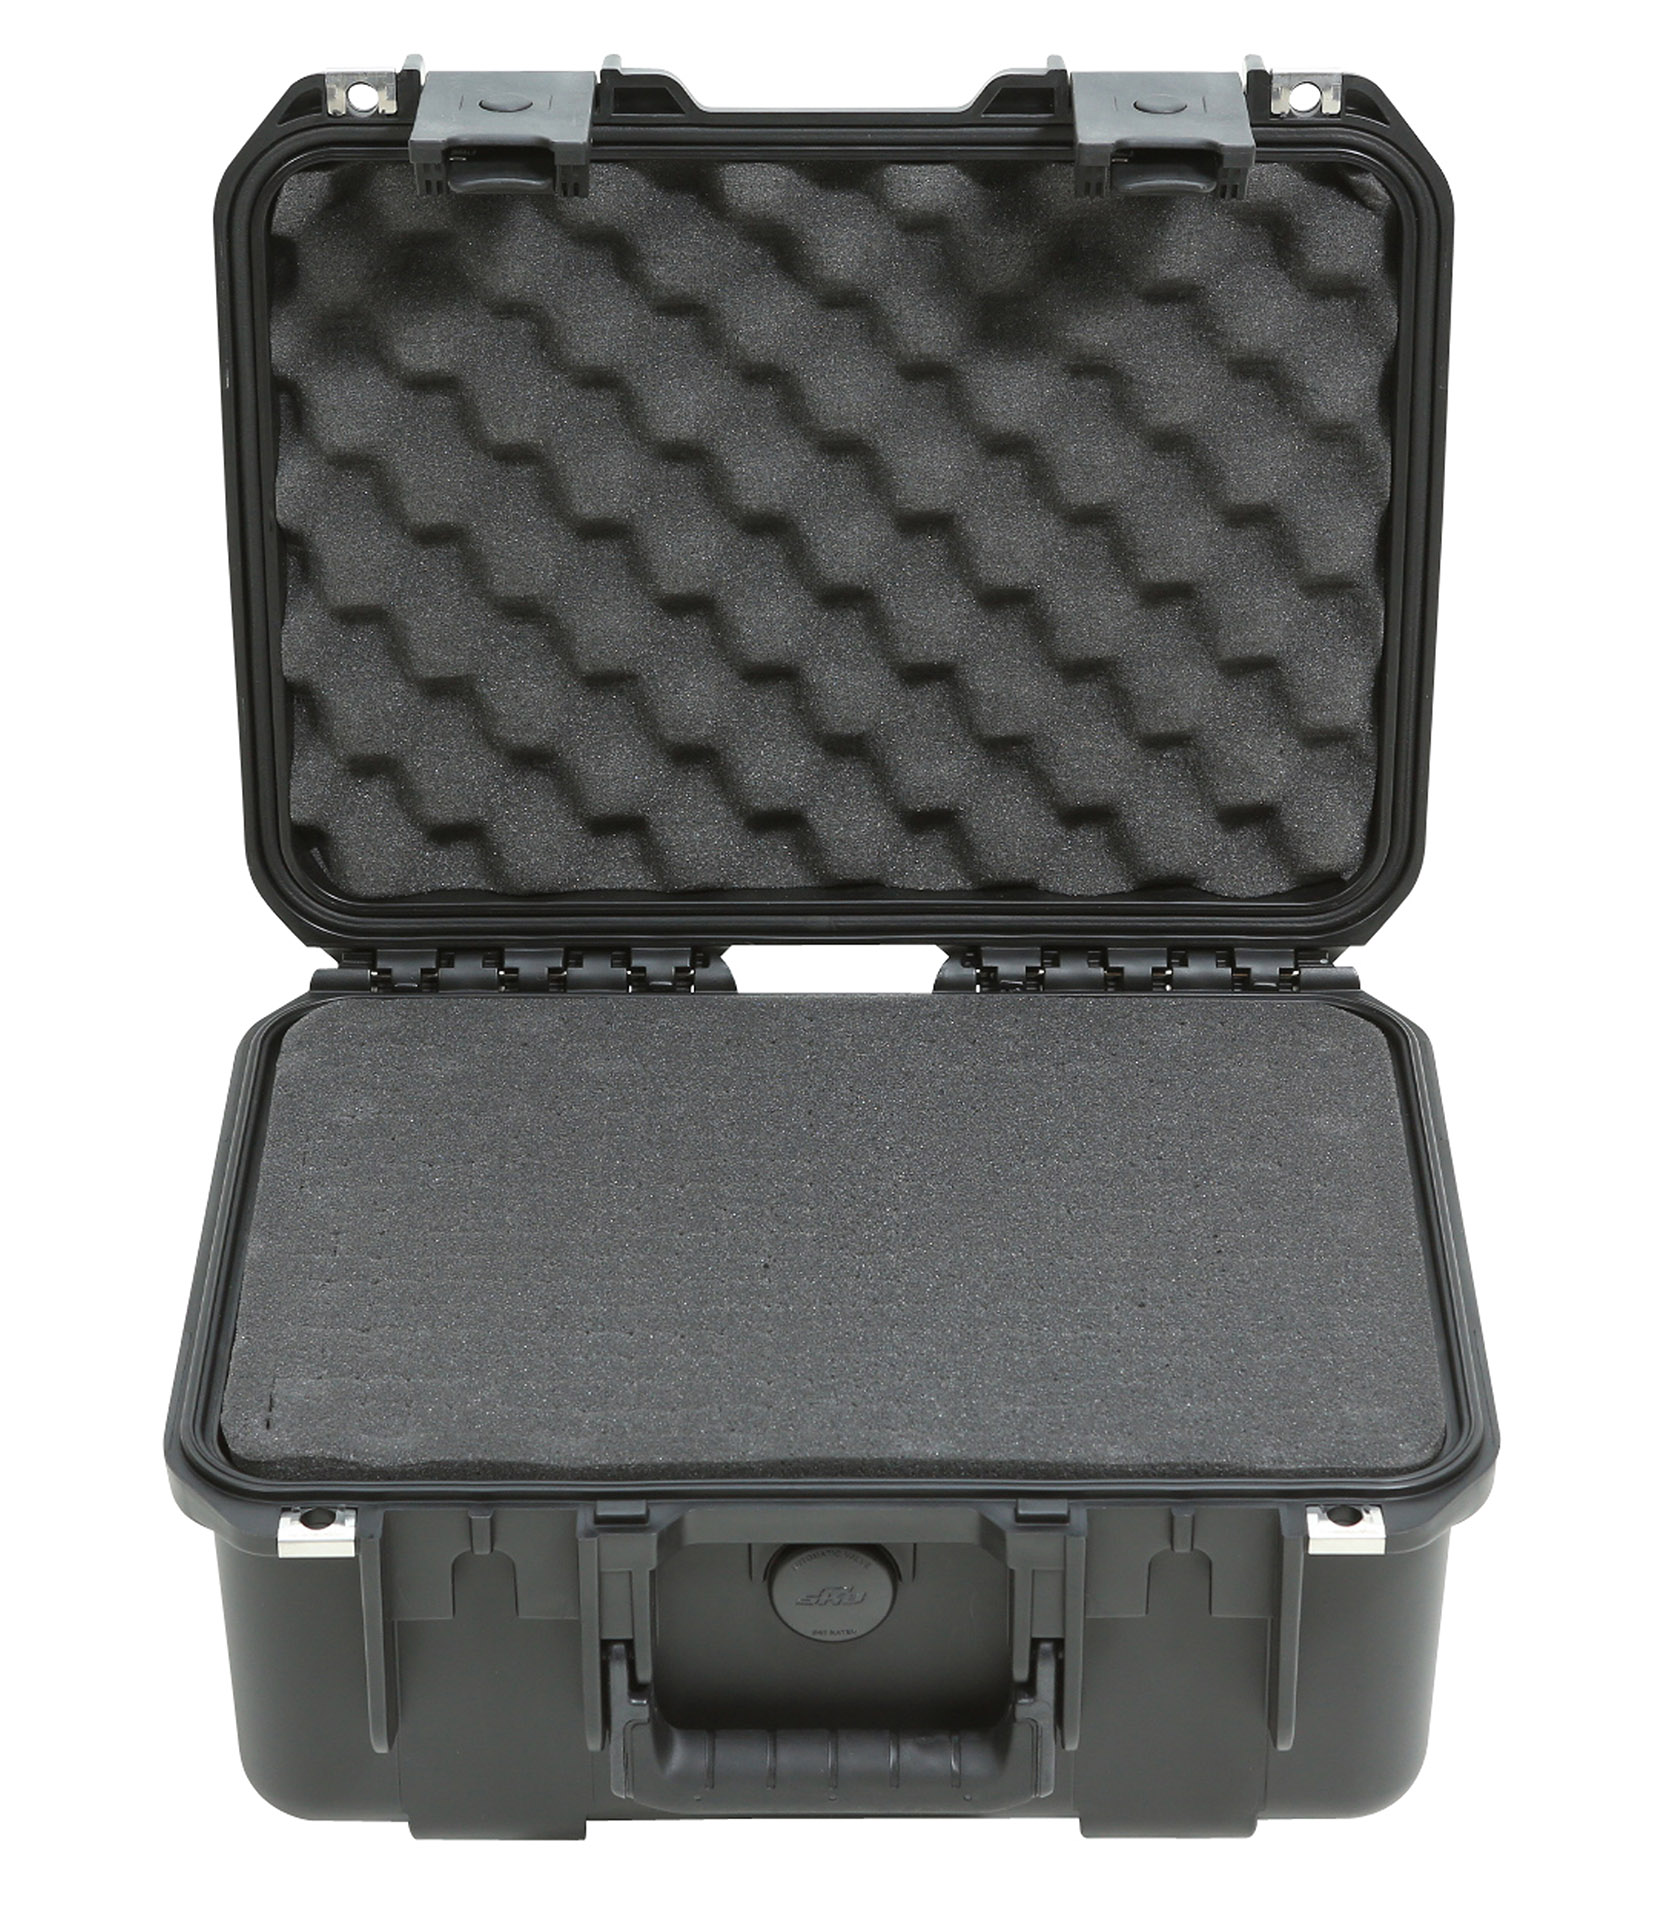 Buy skb - 3I 1309 6B C 13 X 9 X 6Cubed Foam